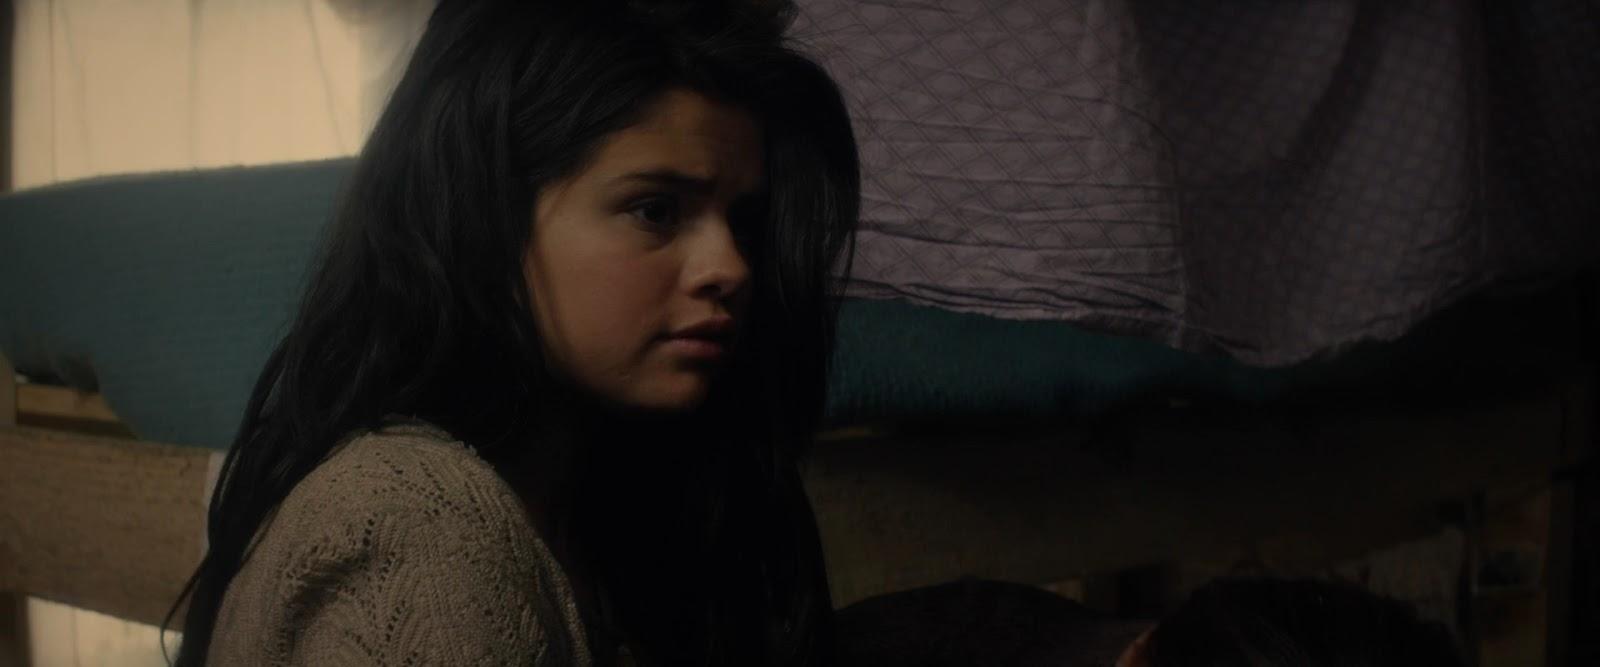 Una Lucha Incierta (2016) 1080p Latino - Ingles captura 2